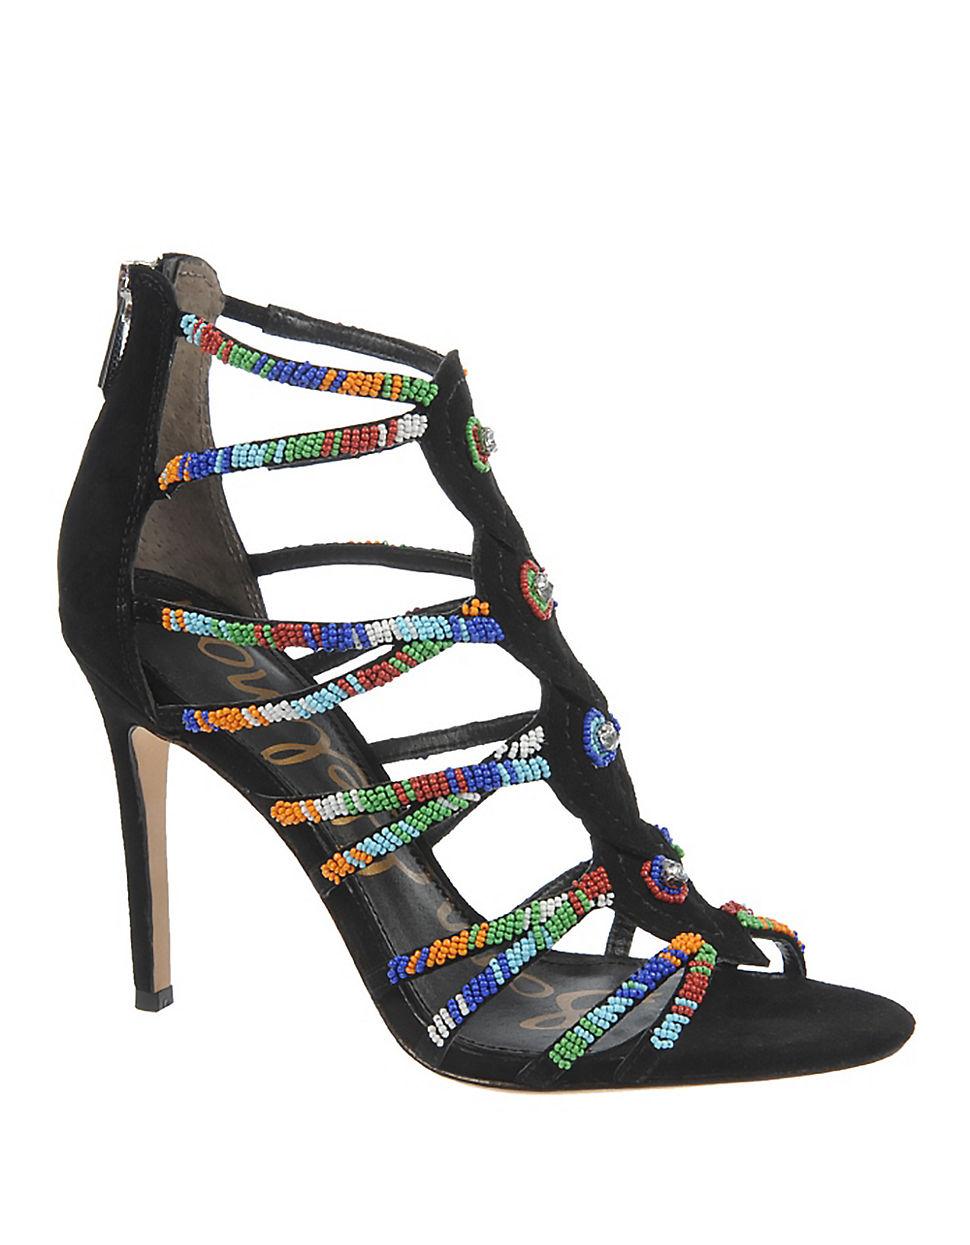 807a66b46 Lyst - Sam Edelman Sage Beaded High-heel Sandals in Black